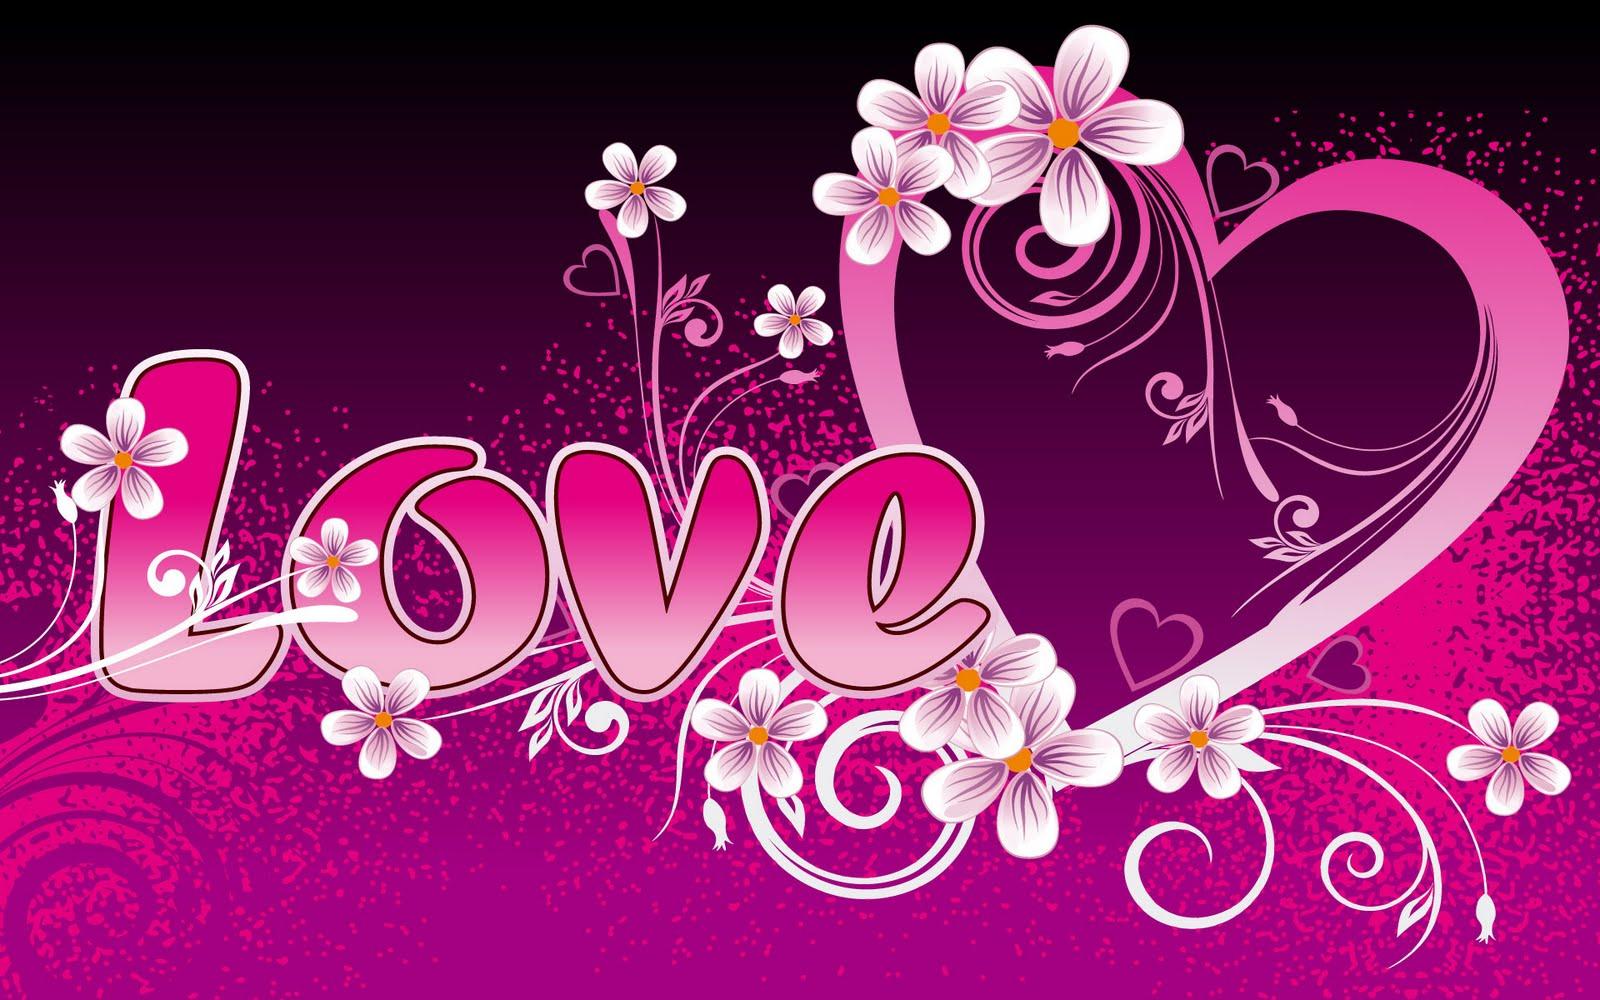 Imagenes De Amor Corazones - Imágenes Corazones de amor